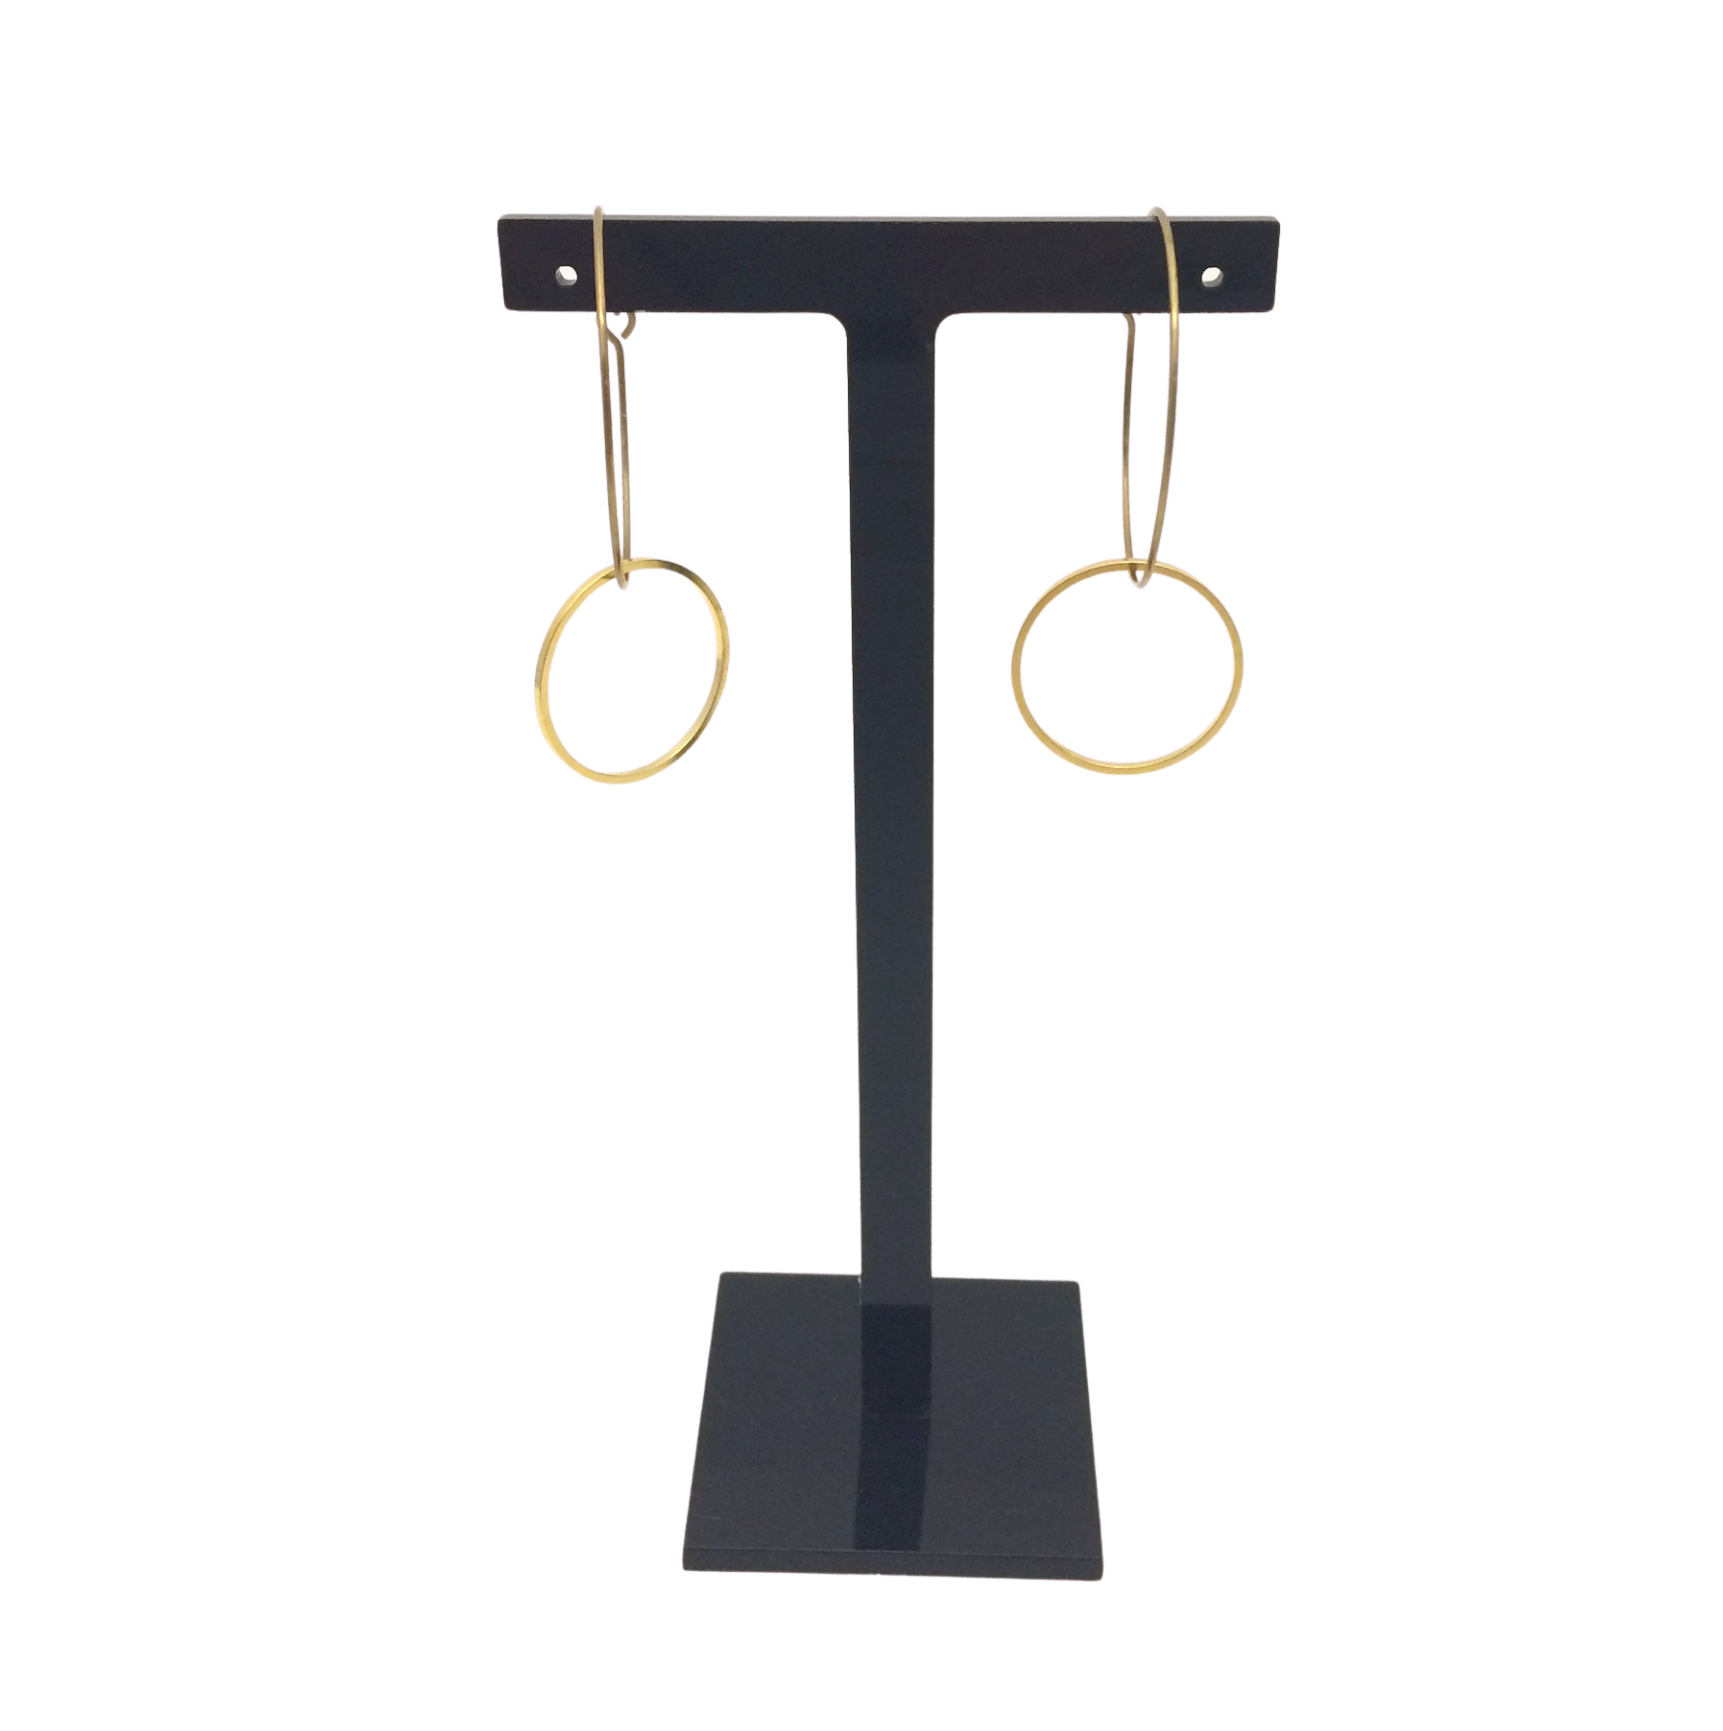 Irth Circle Medium Brass Hoops